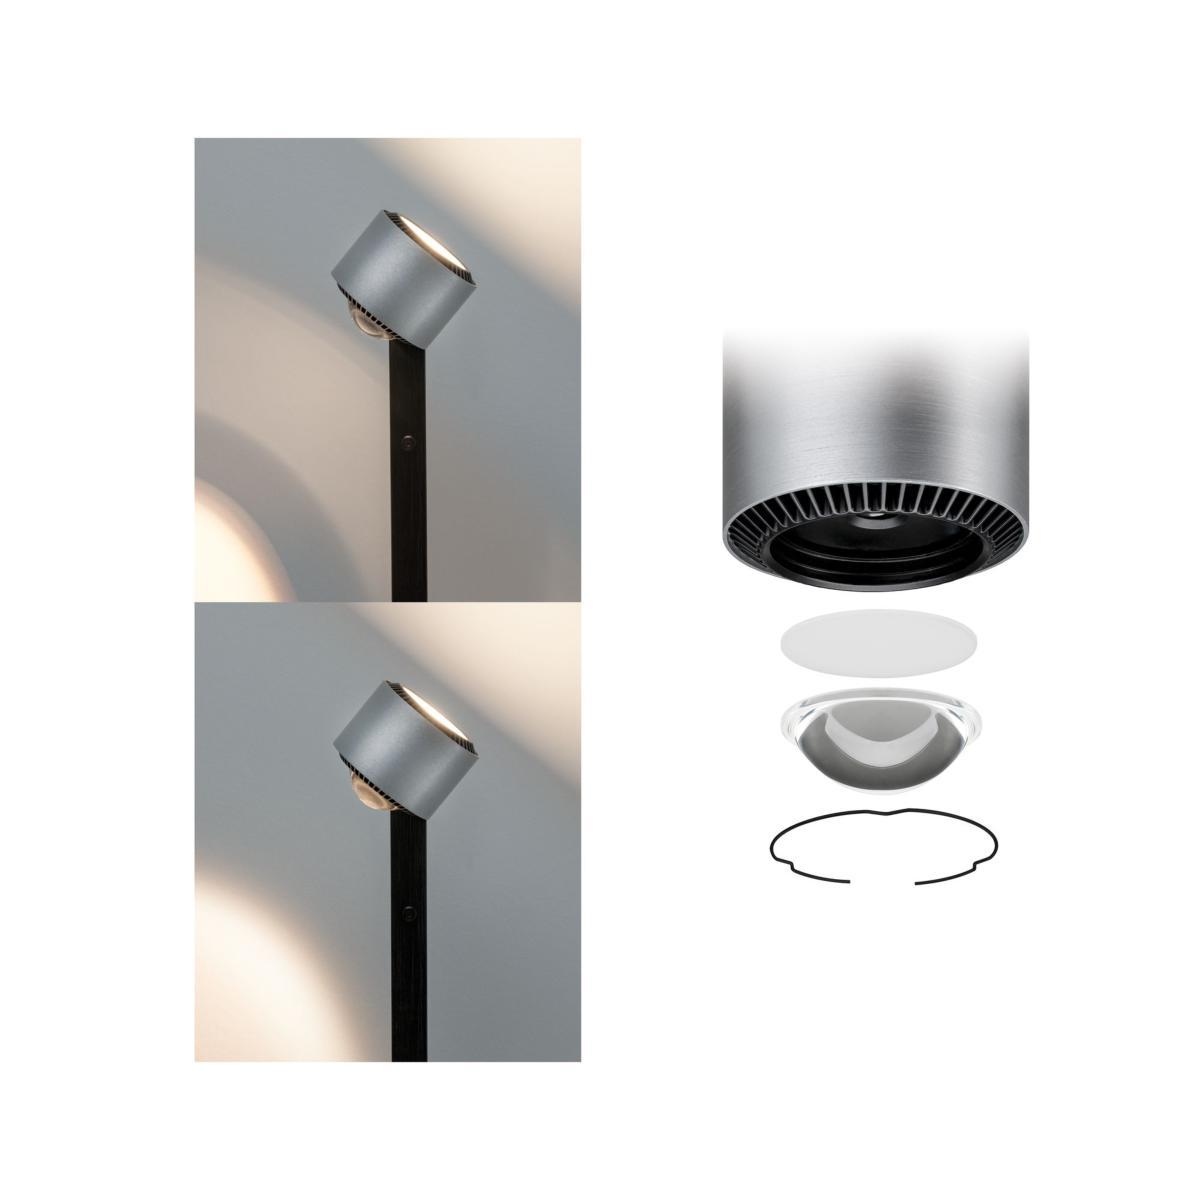 lampadaire led aldan 17w noir et alu brosse eclairage tableau